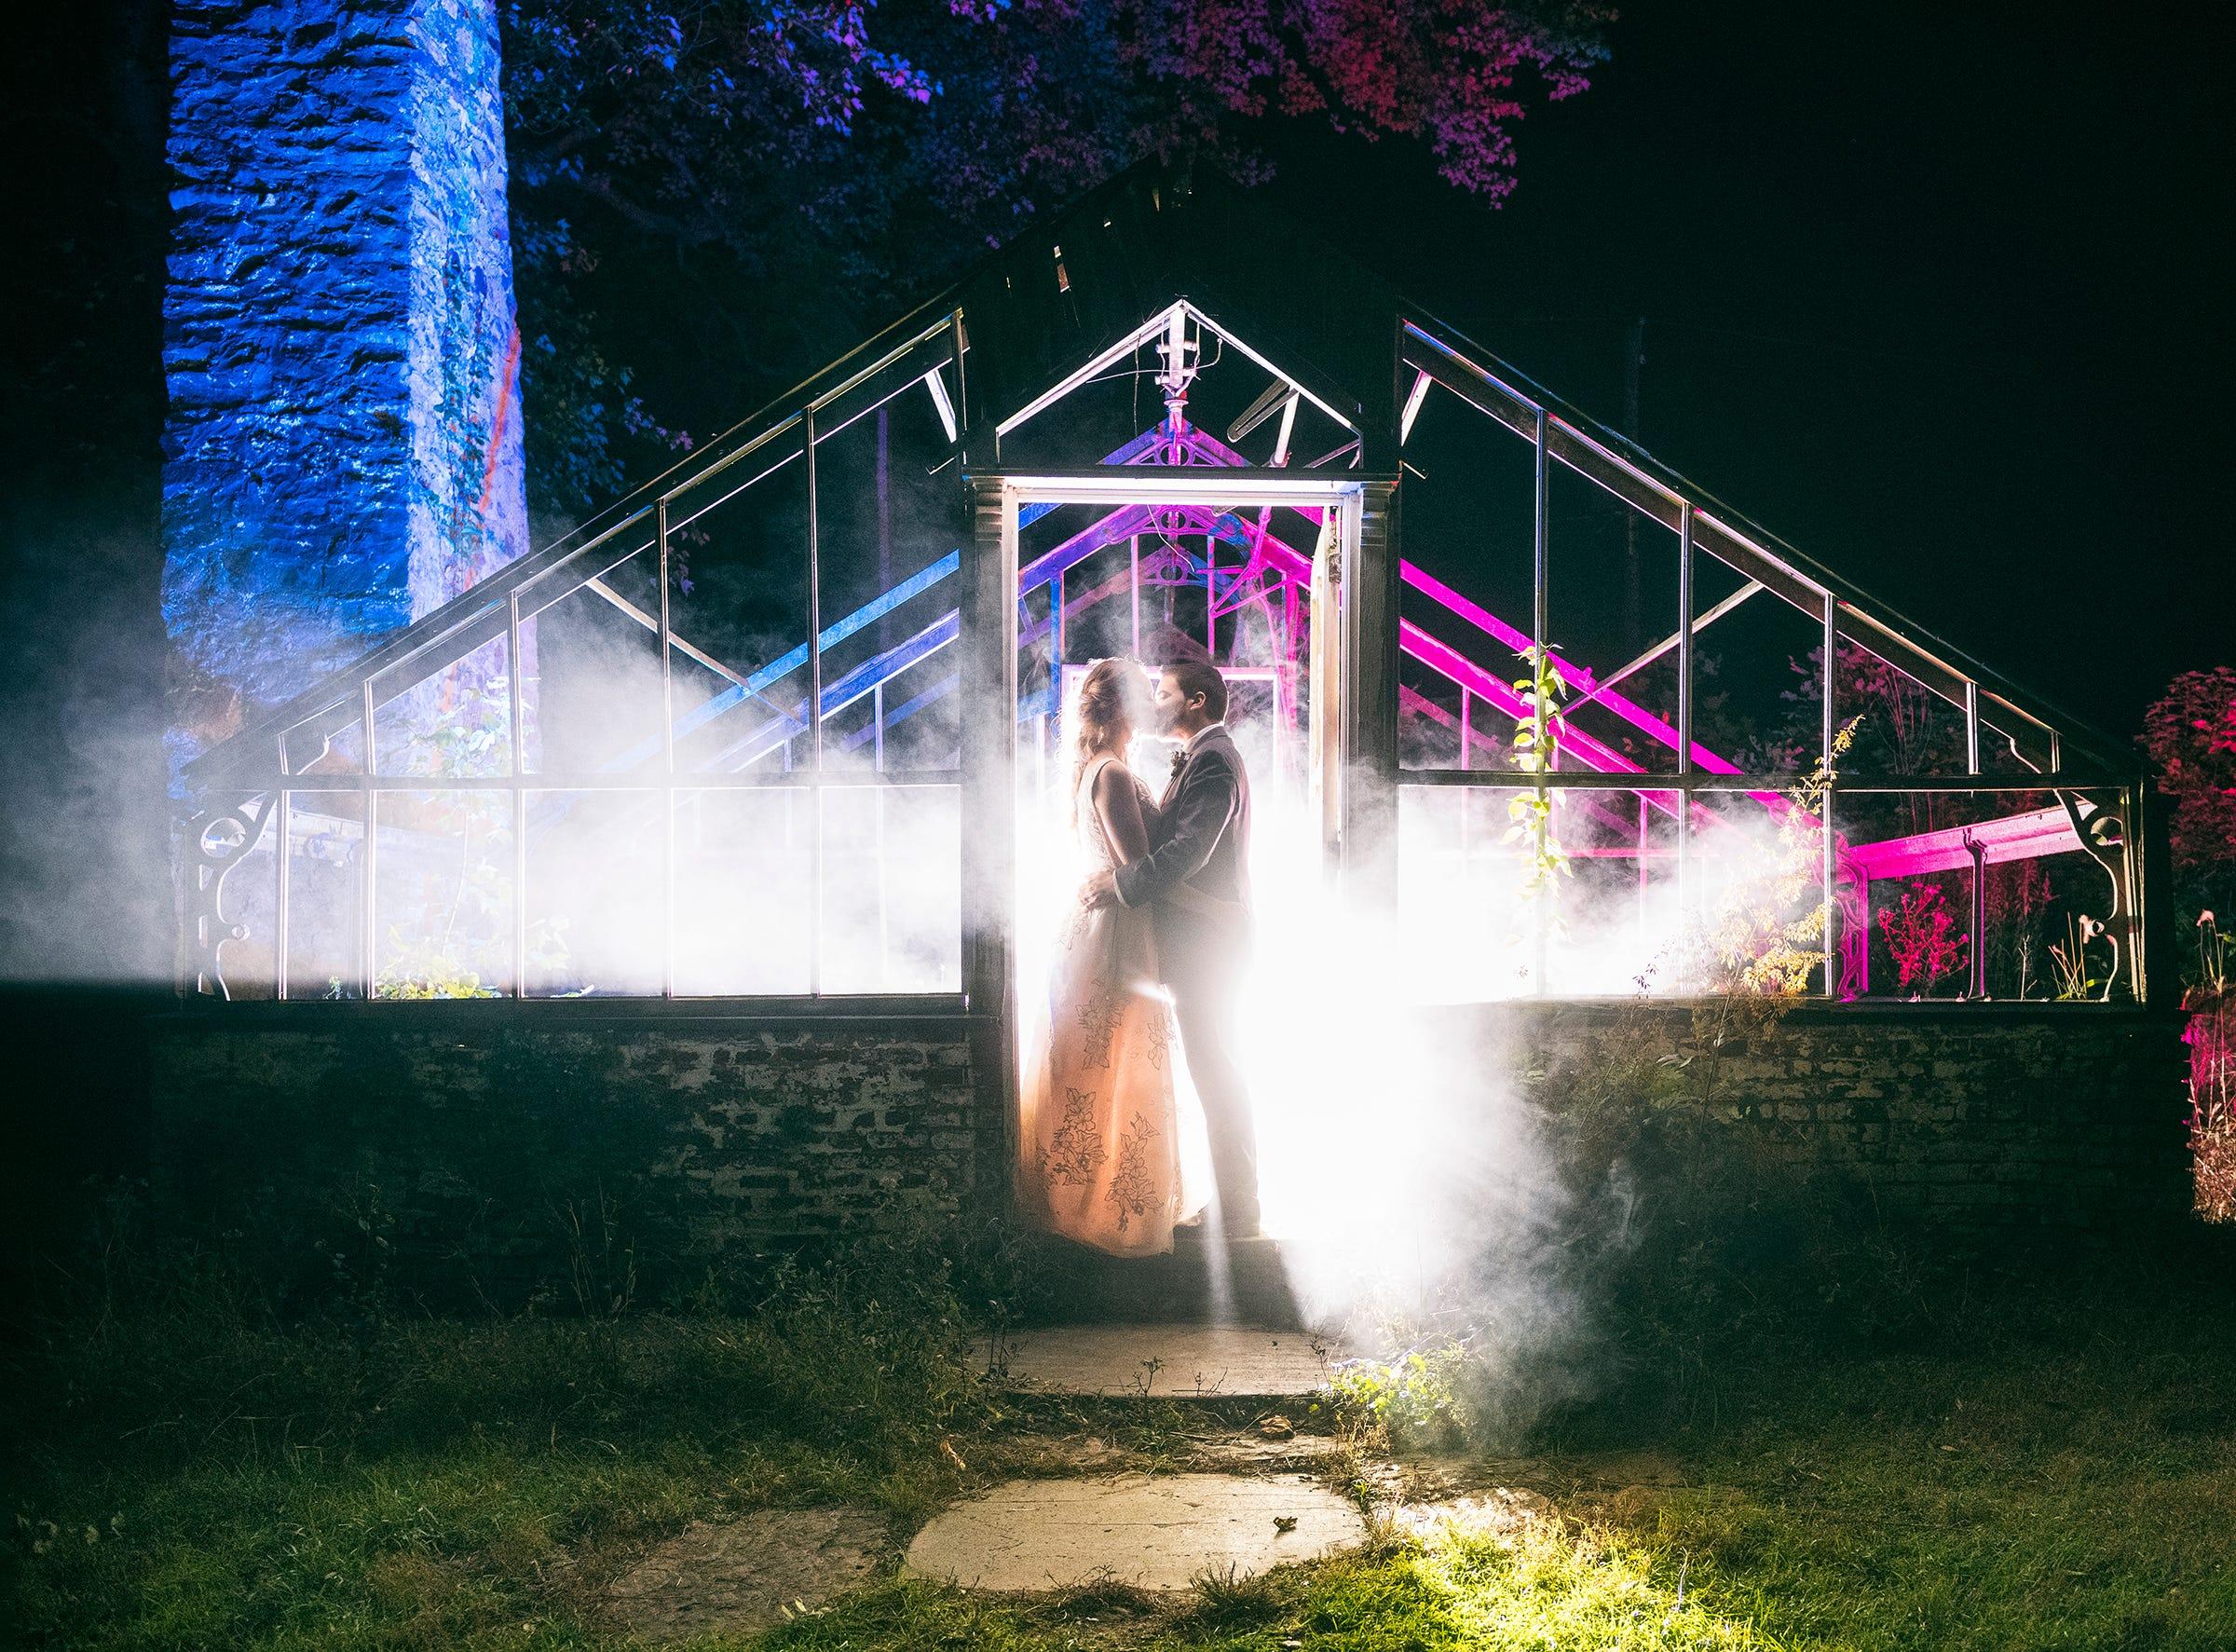 The wedding of Valerie and Kiel Cheesman at Philander Chase Knox Estate at Malvern, Pennsylvania.